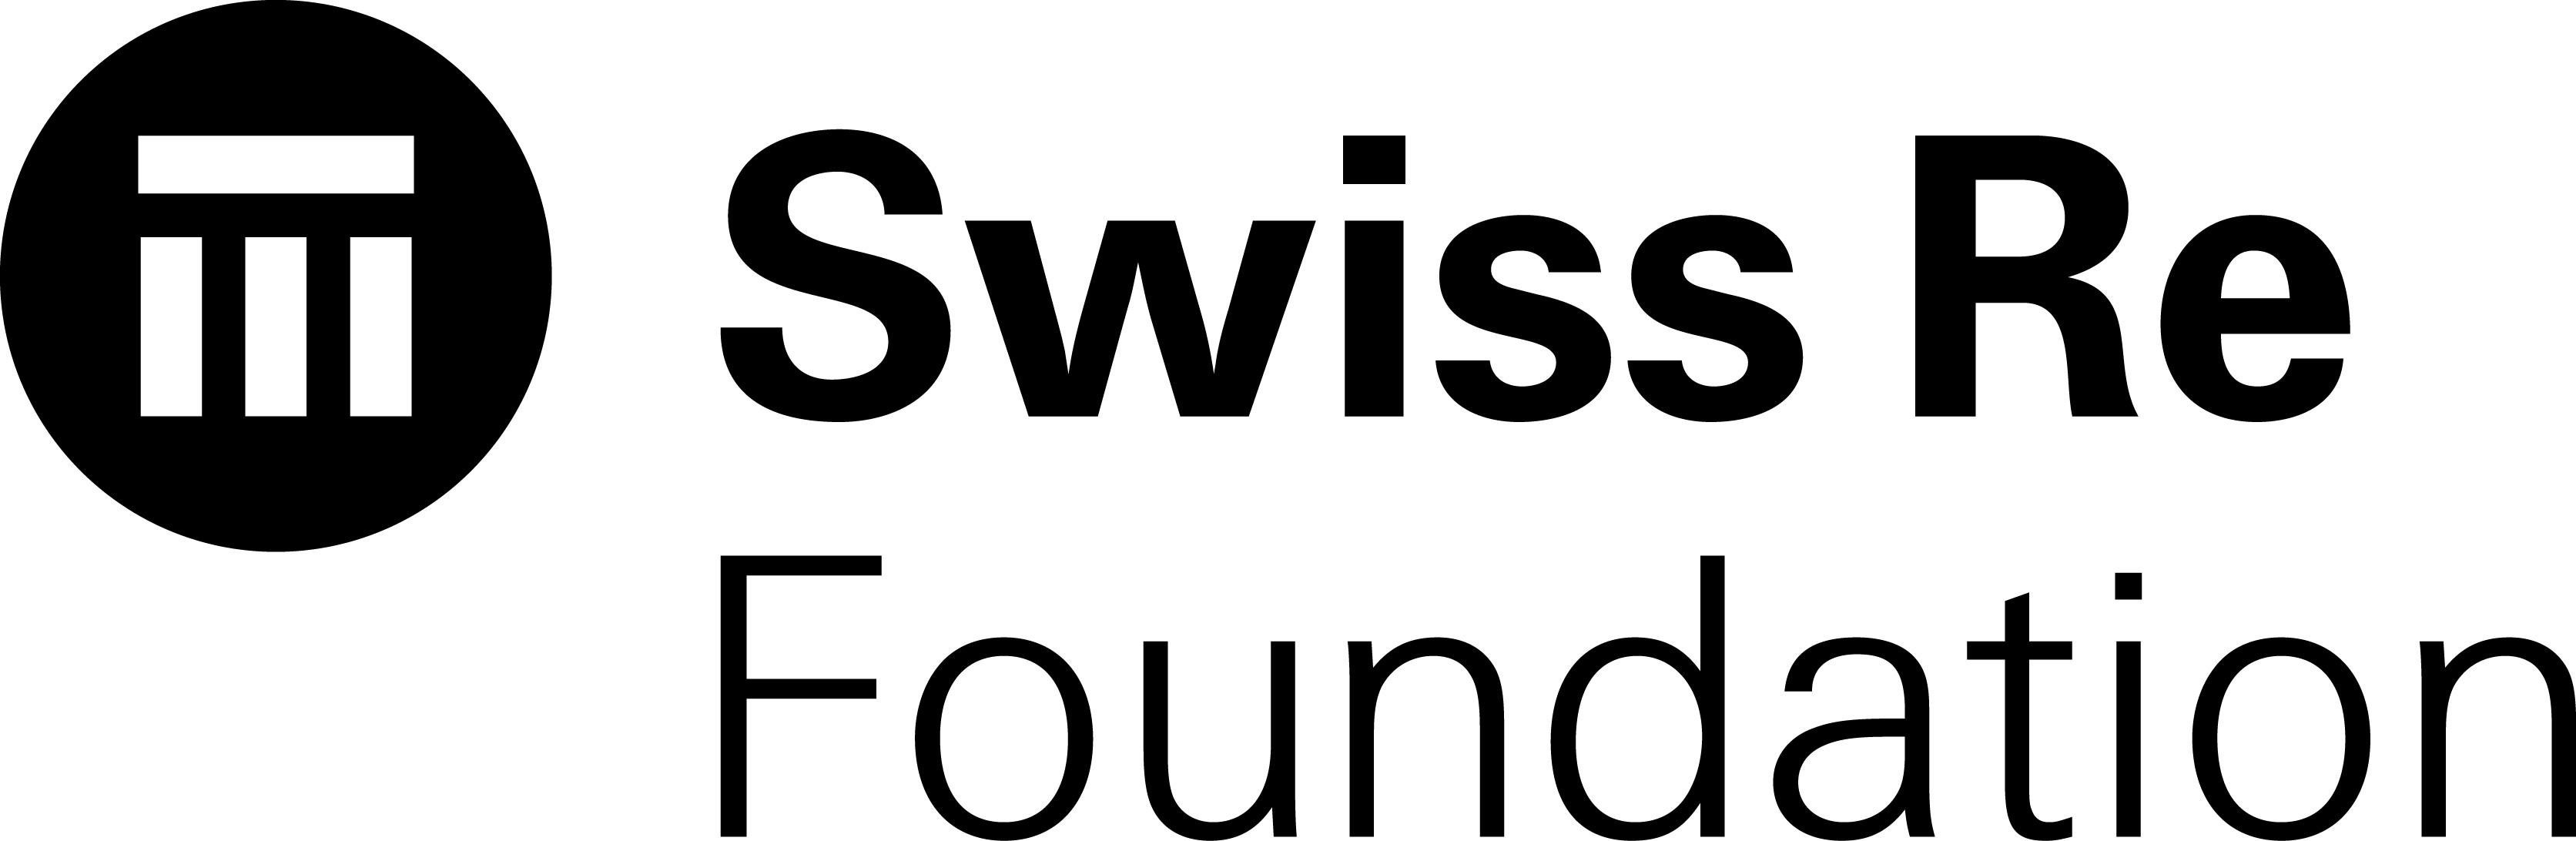 Swiss Re Foundation